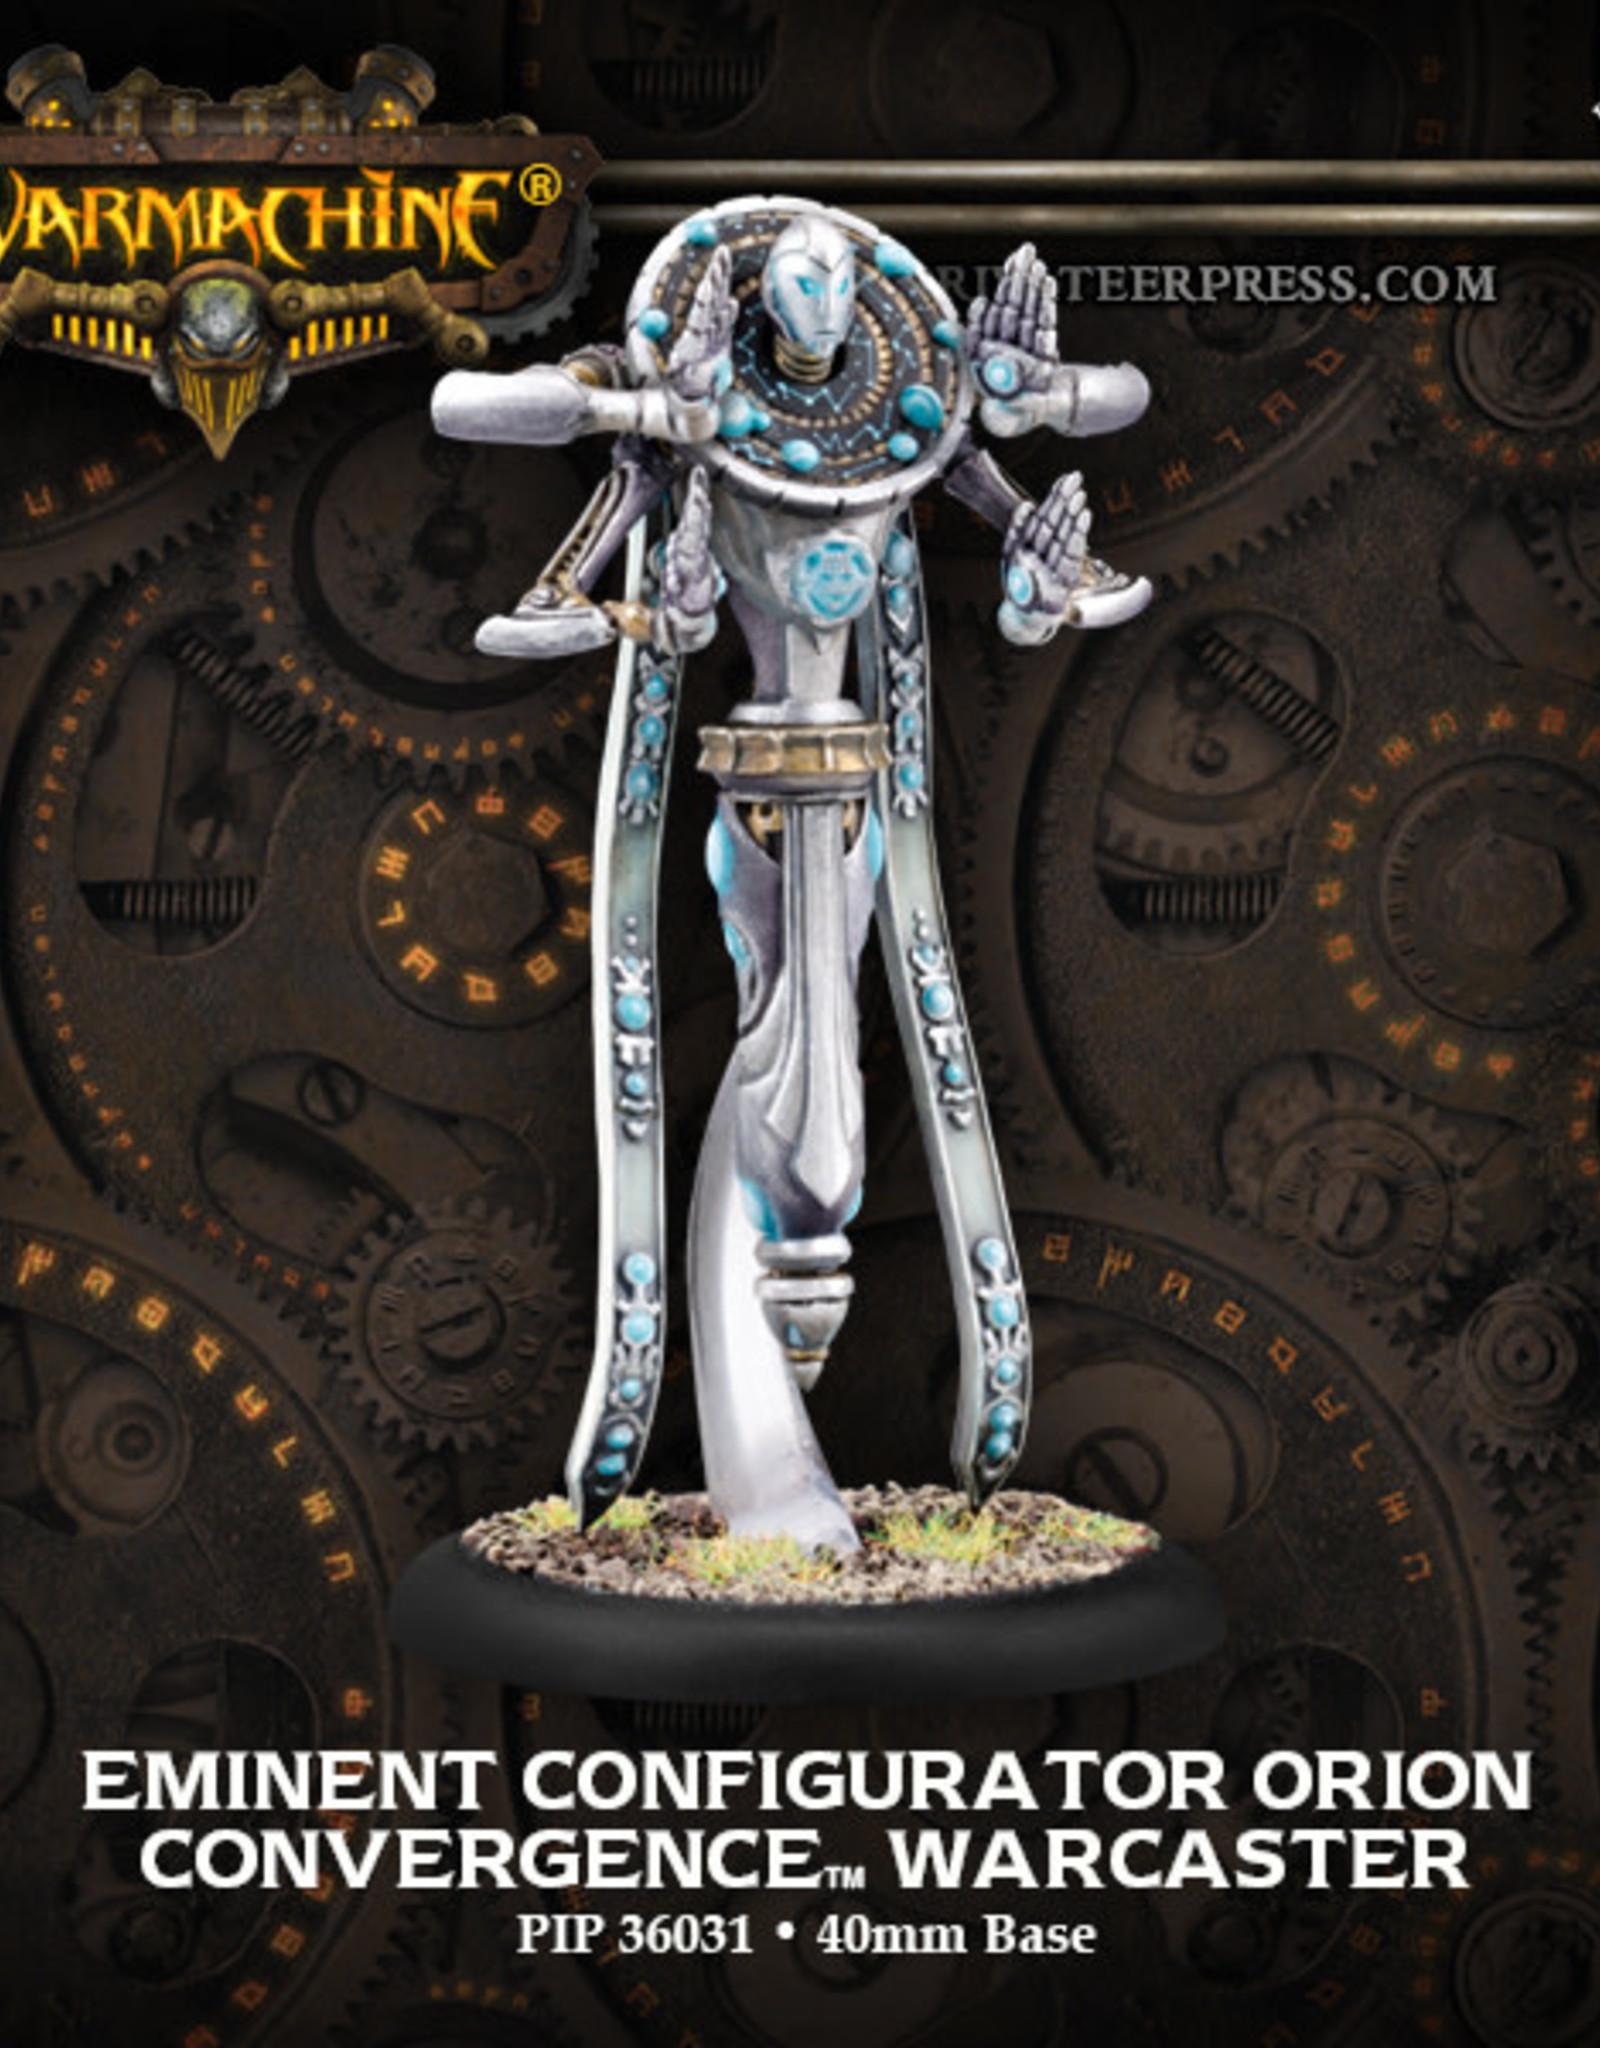 Warmachine Cyriss - Eminent Configurator Orion